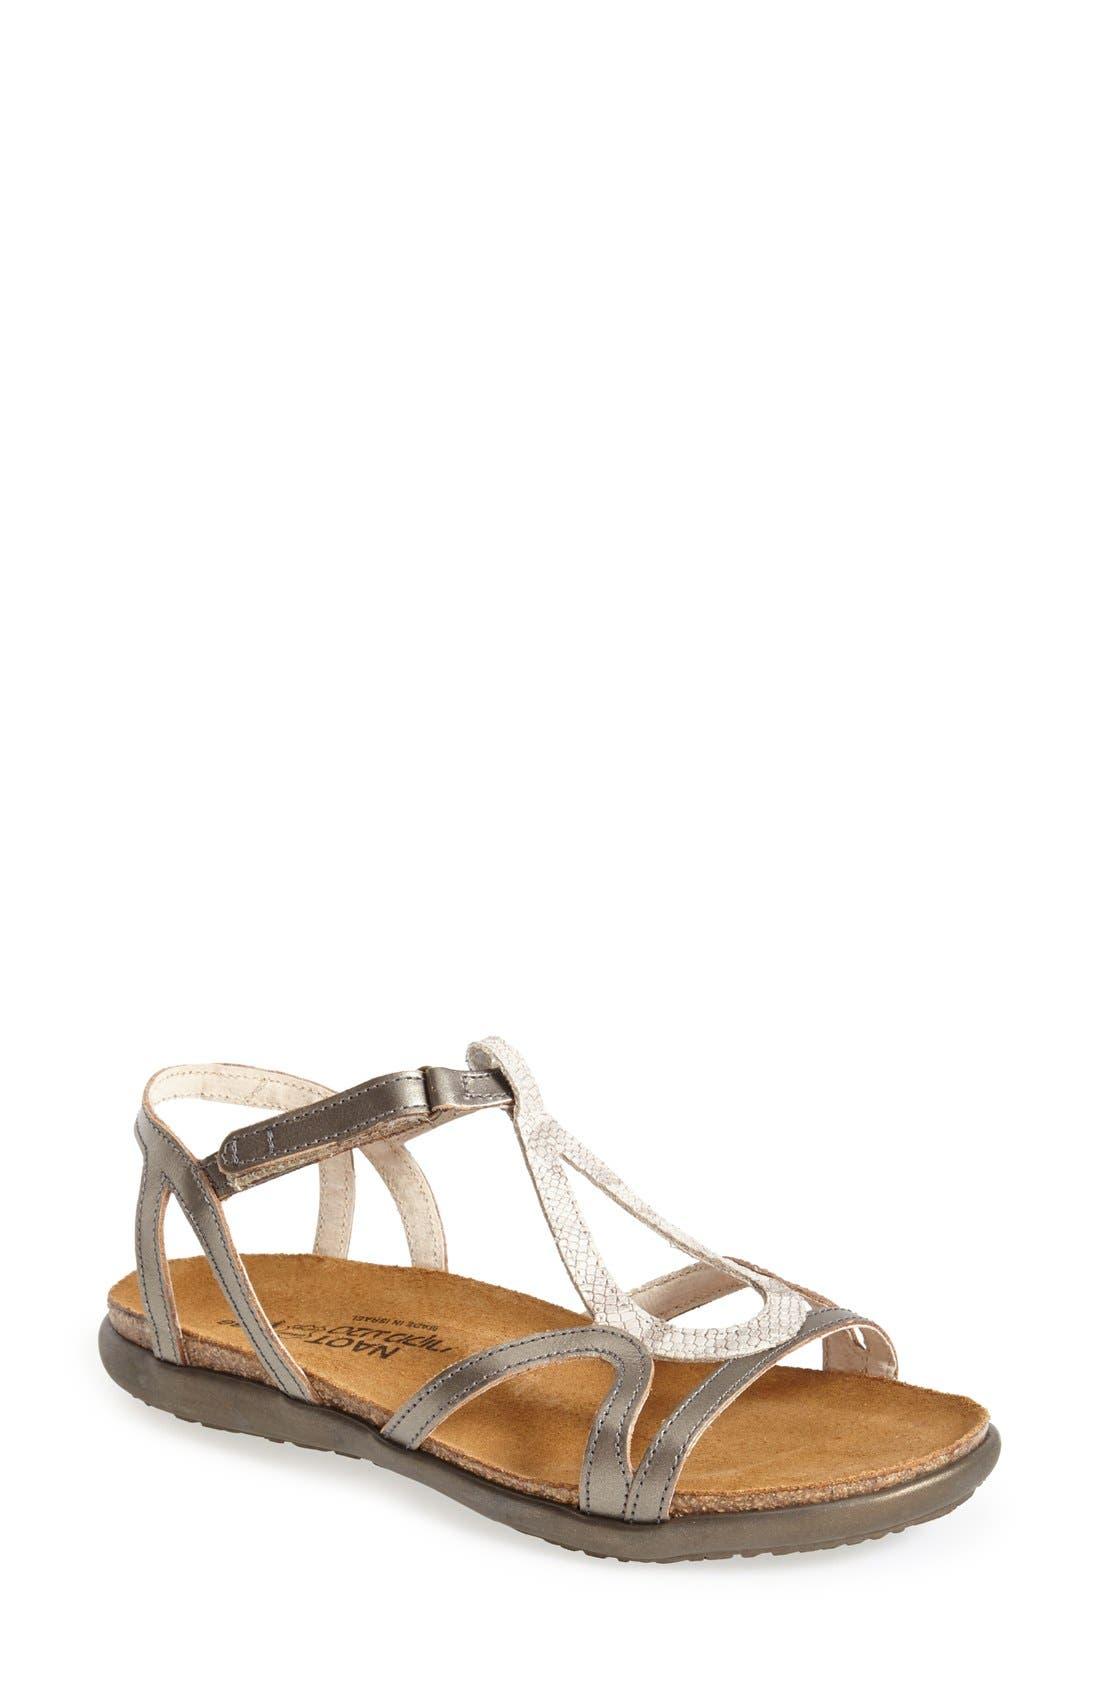 Naot 'Dorith' Sandal